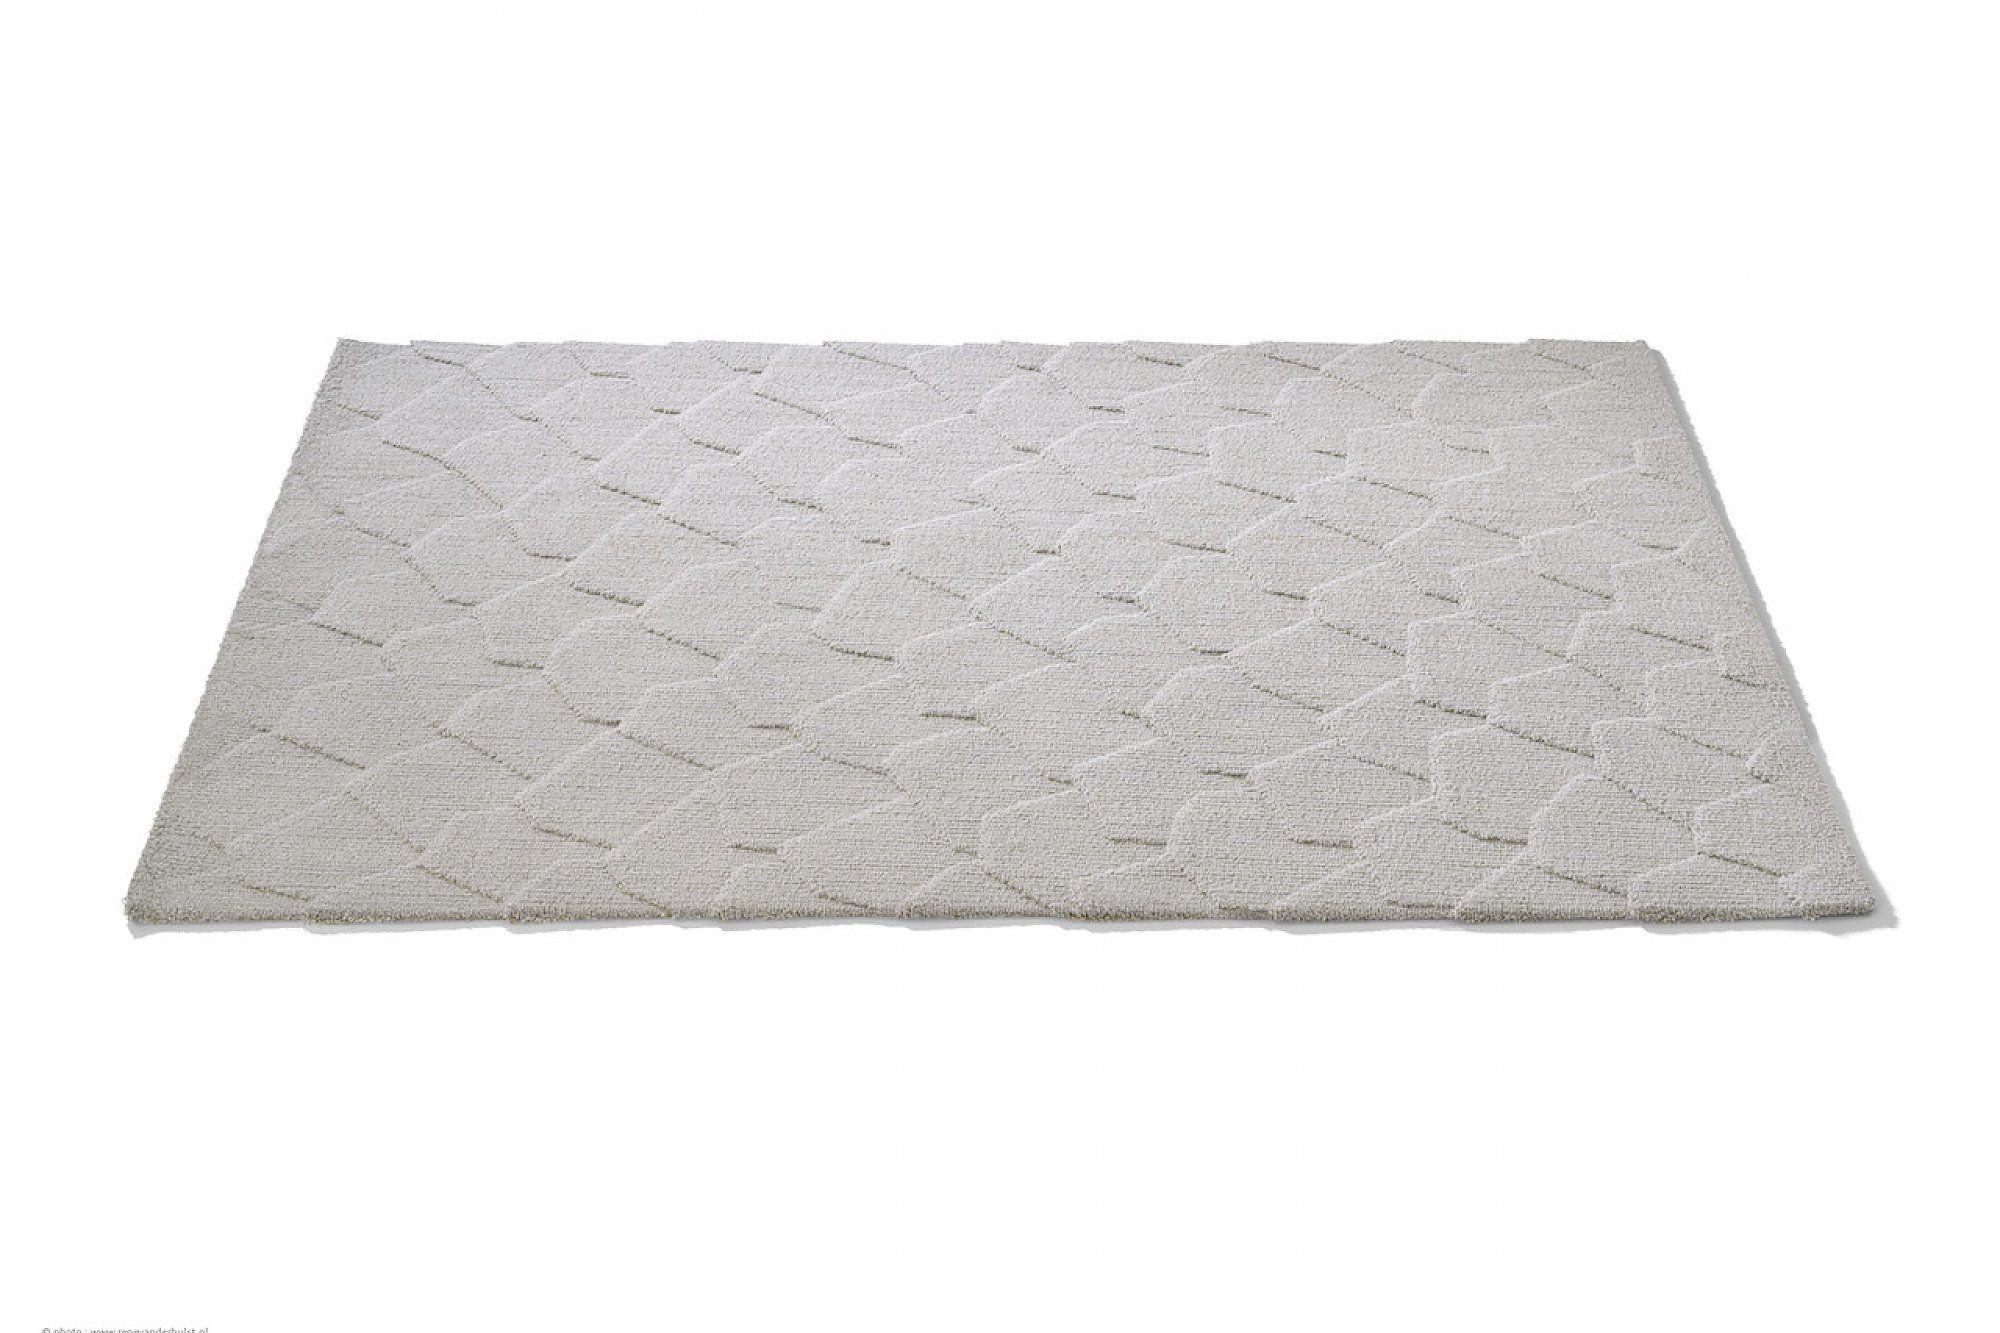 3d Surfaces Scales Rugs On Carpet Carpet Door Accessories